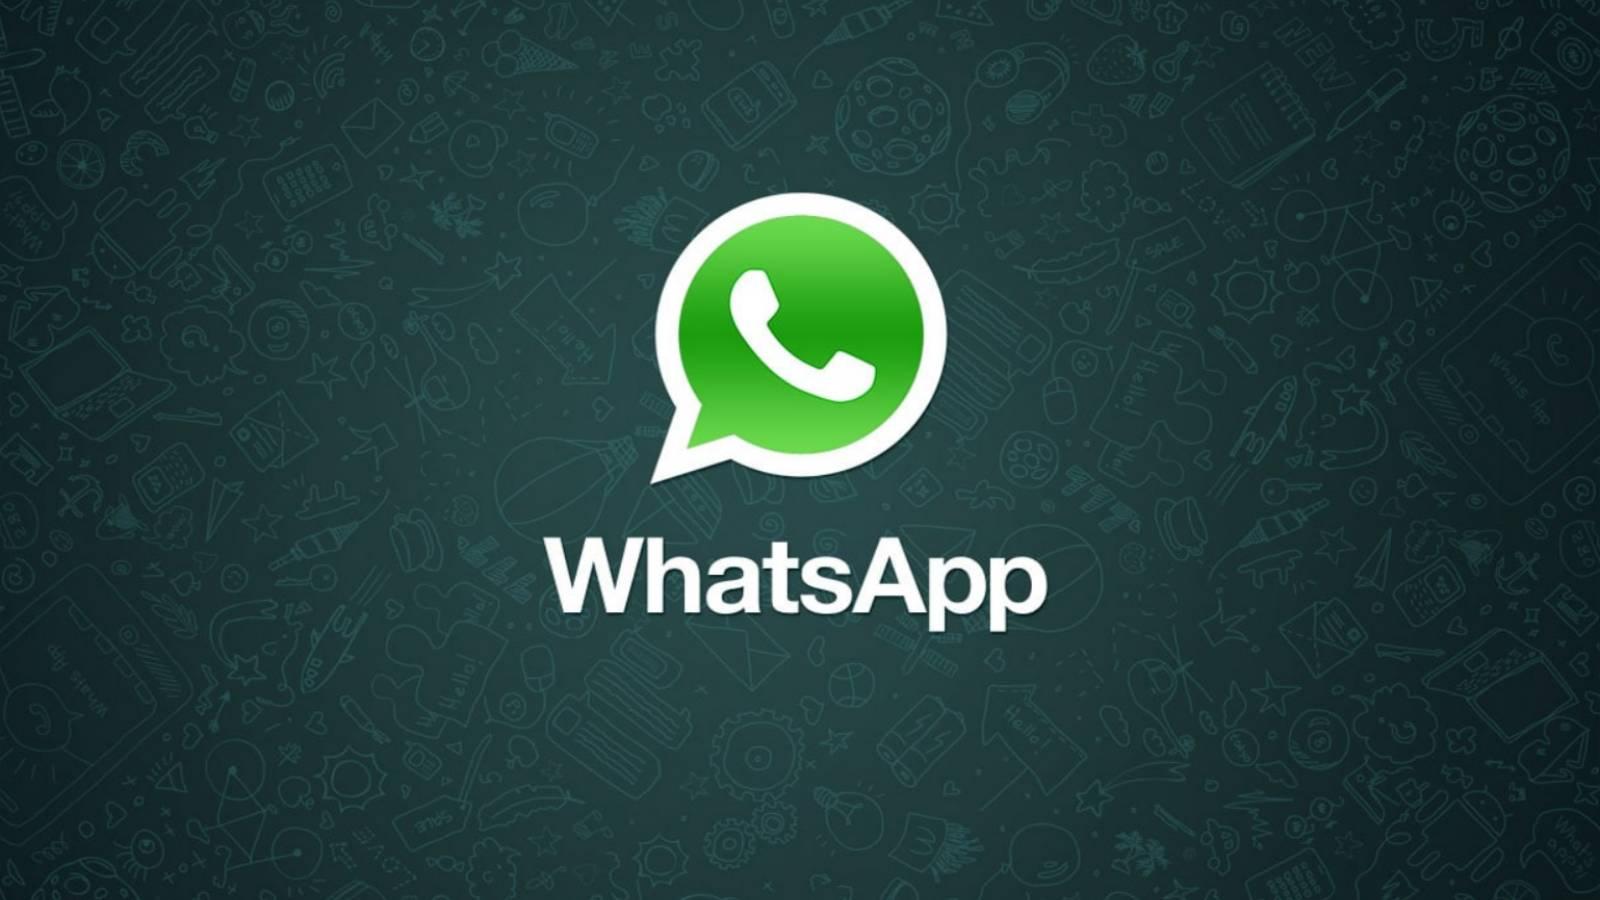 WhatsApp promovare